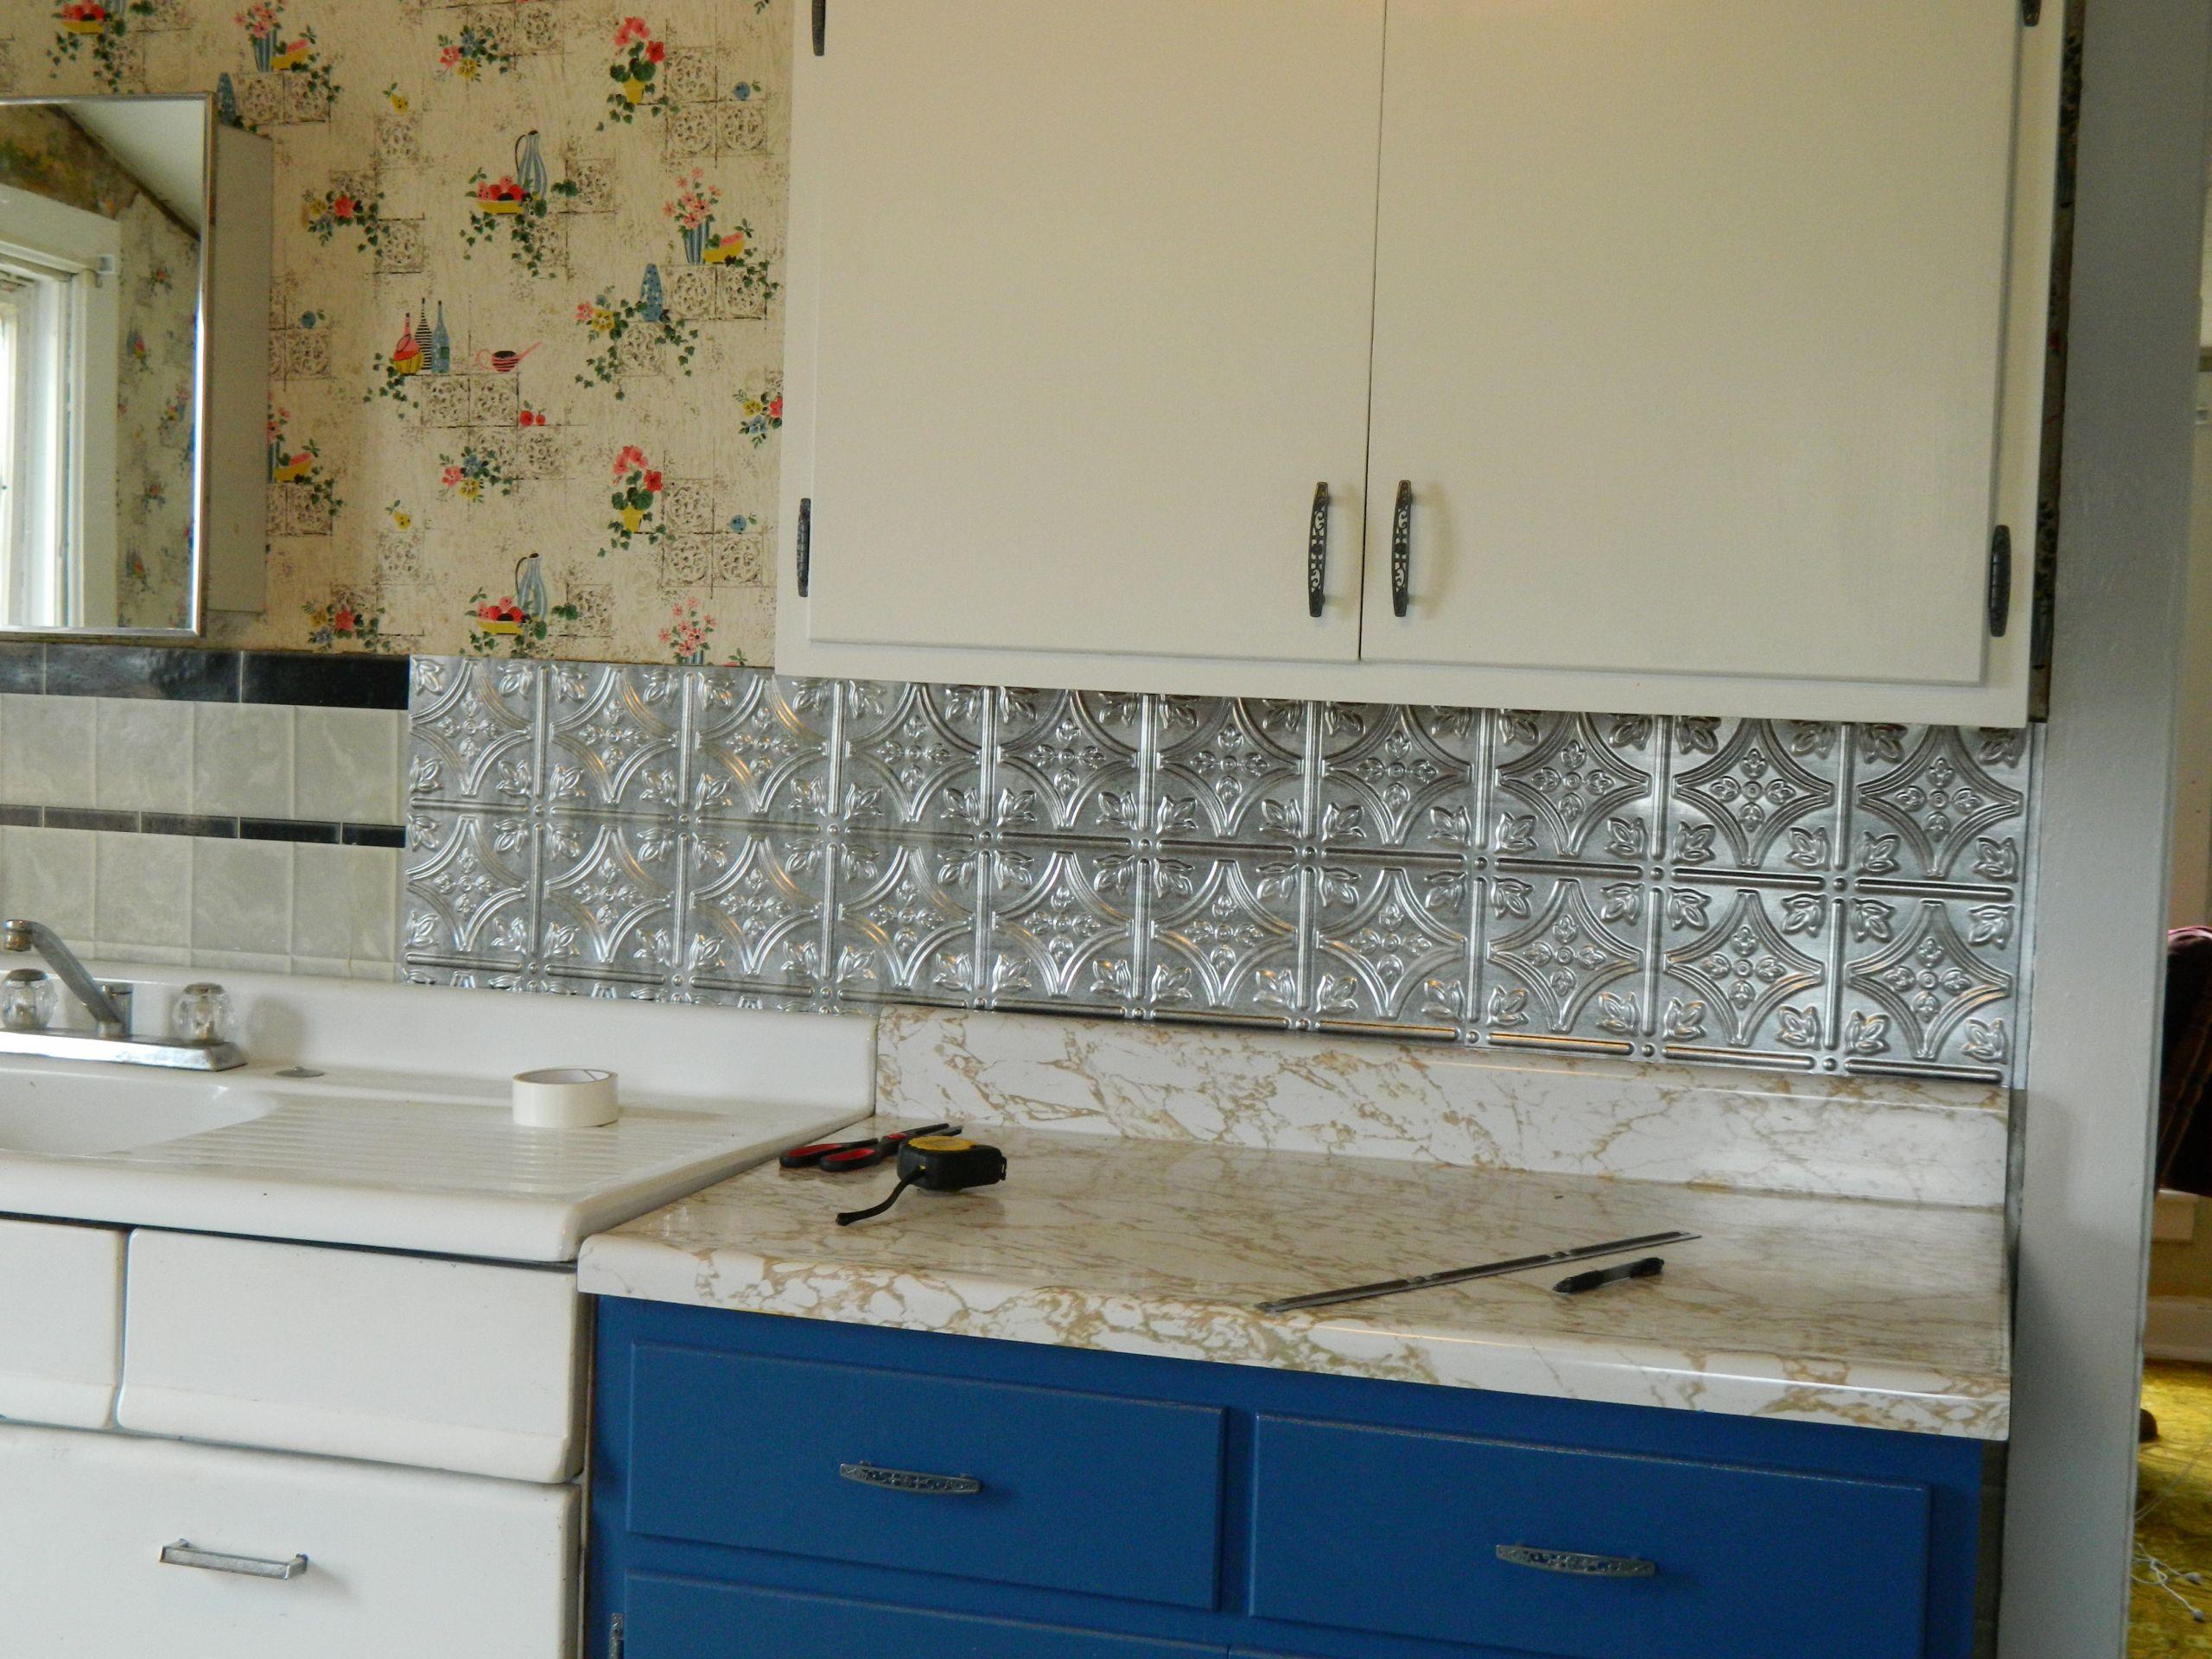 Kitchen Peel And Stick Backsplash  DIY 5 Steps to Kitchen Backsplash – No Grout Involved